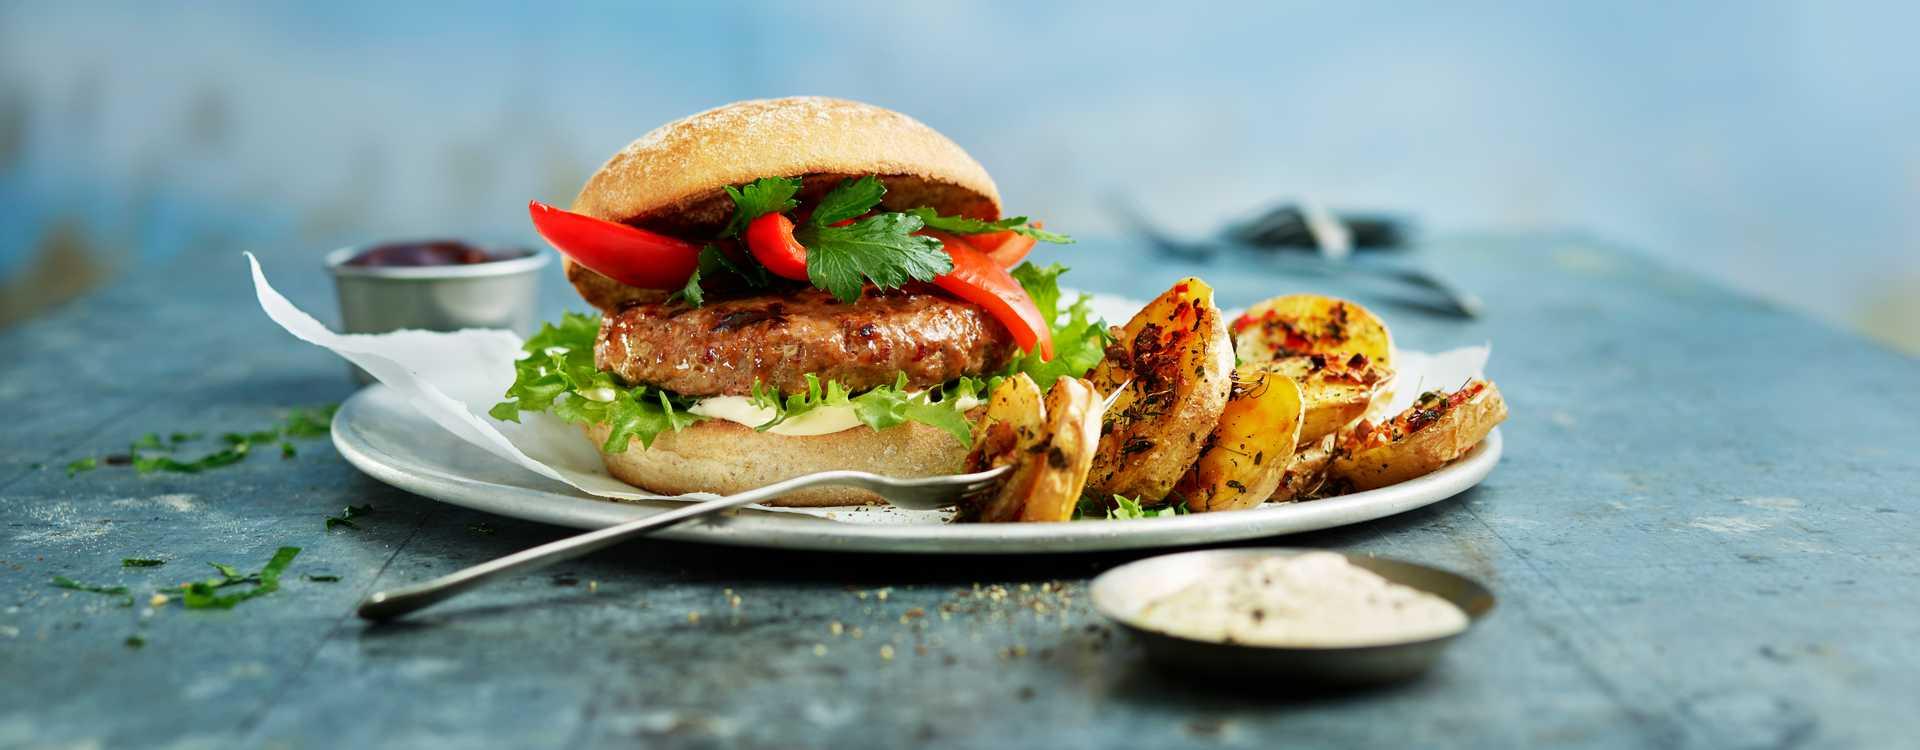 Chorizoburger, ovnsstekte poteter og aioli